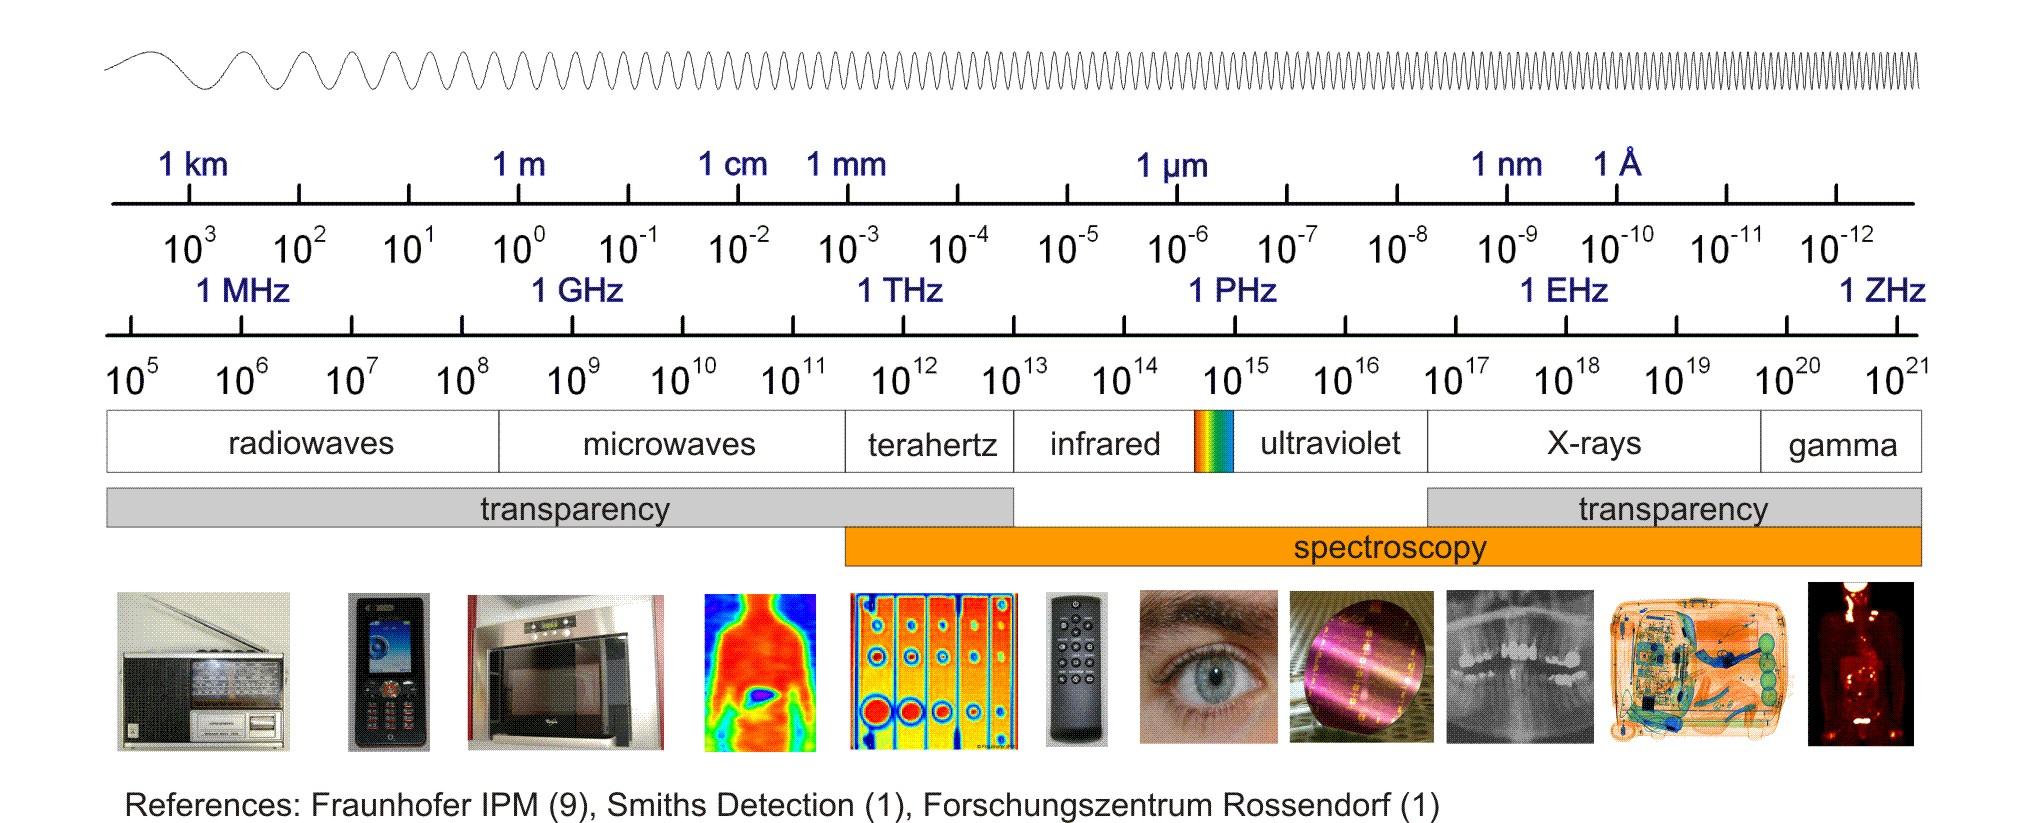 Electromagnetic Spectrum Activity Worksheet